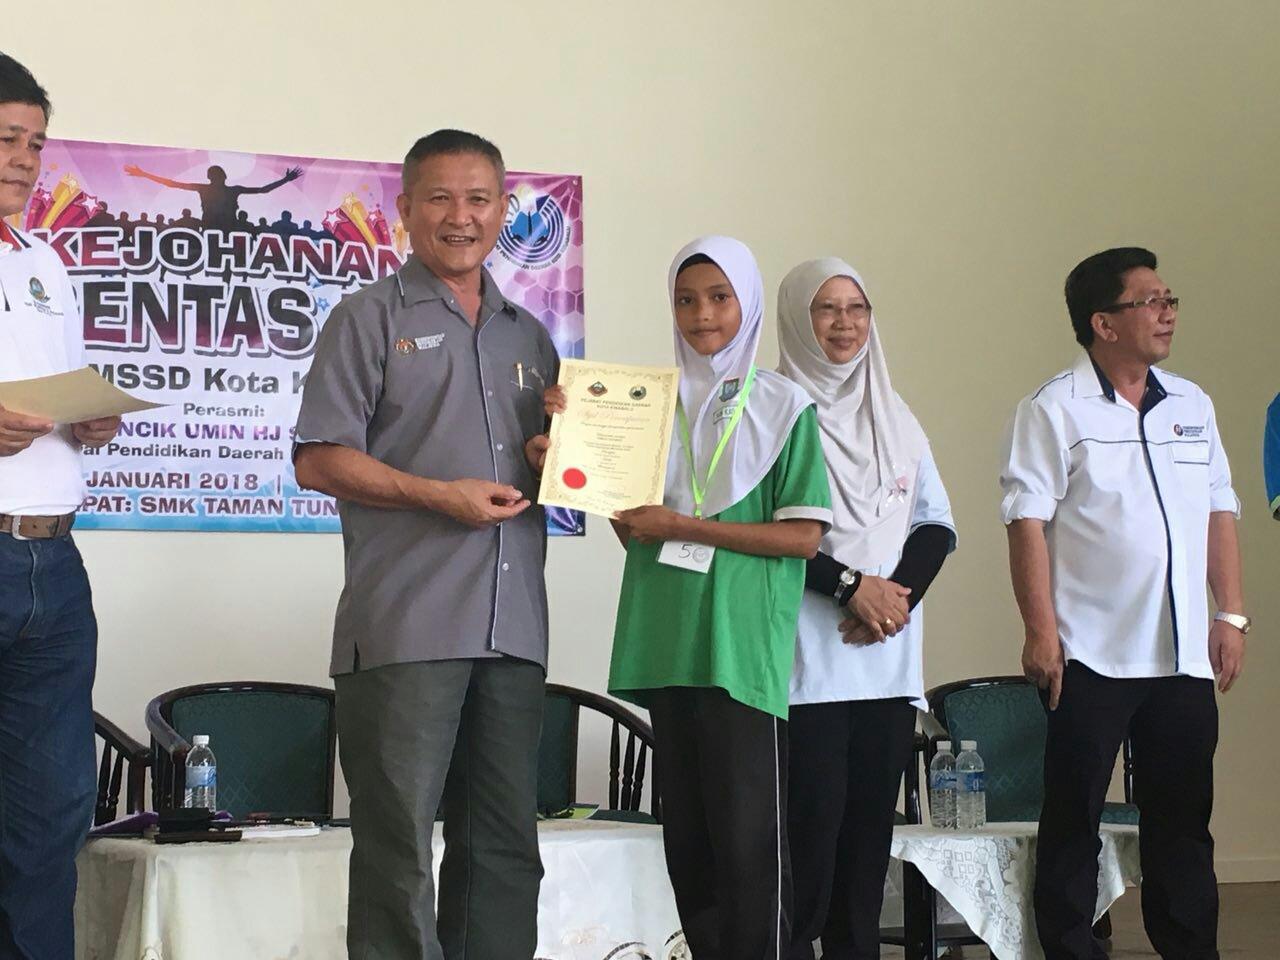 Nur Katija Seurus menerima sijil daripada Pegawai Pendidikan Daerah Kota Kinabalu, Umin bin Hj. Sadi